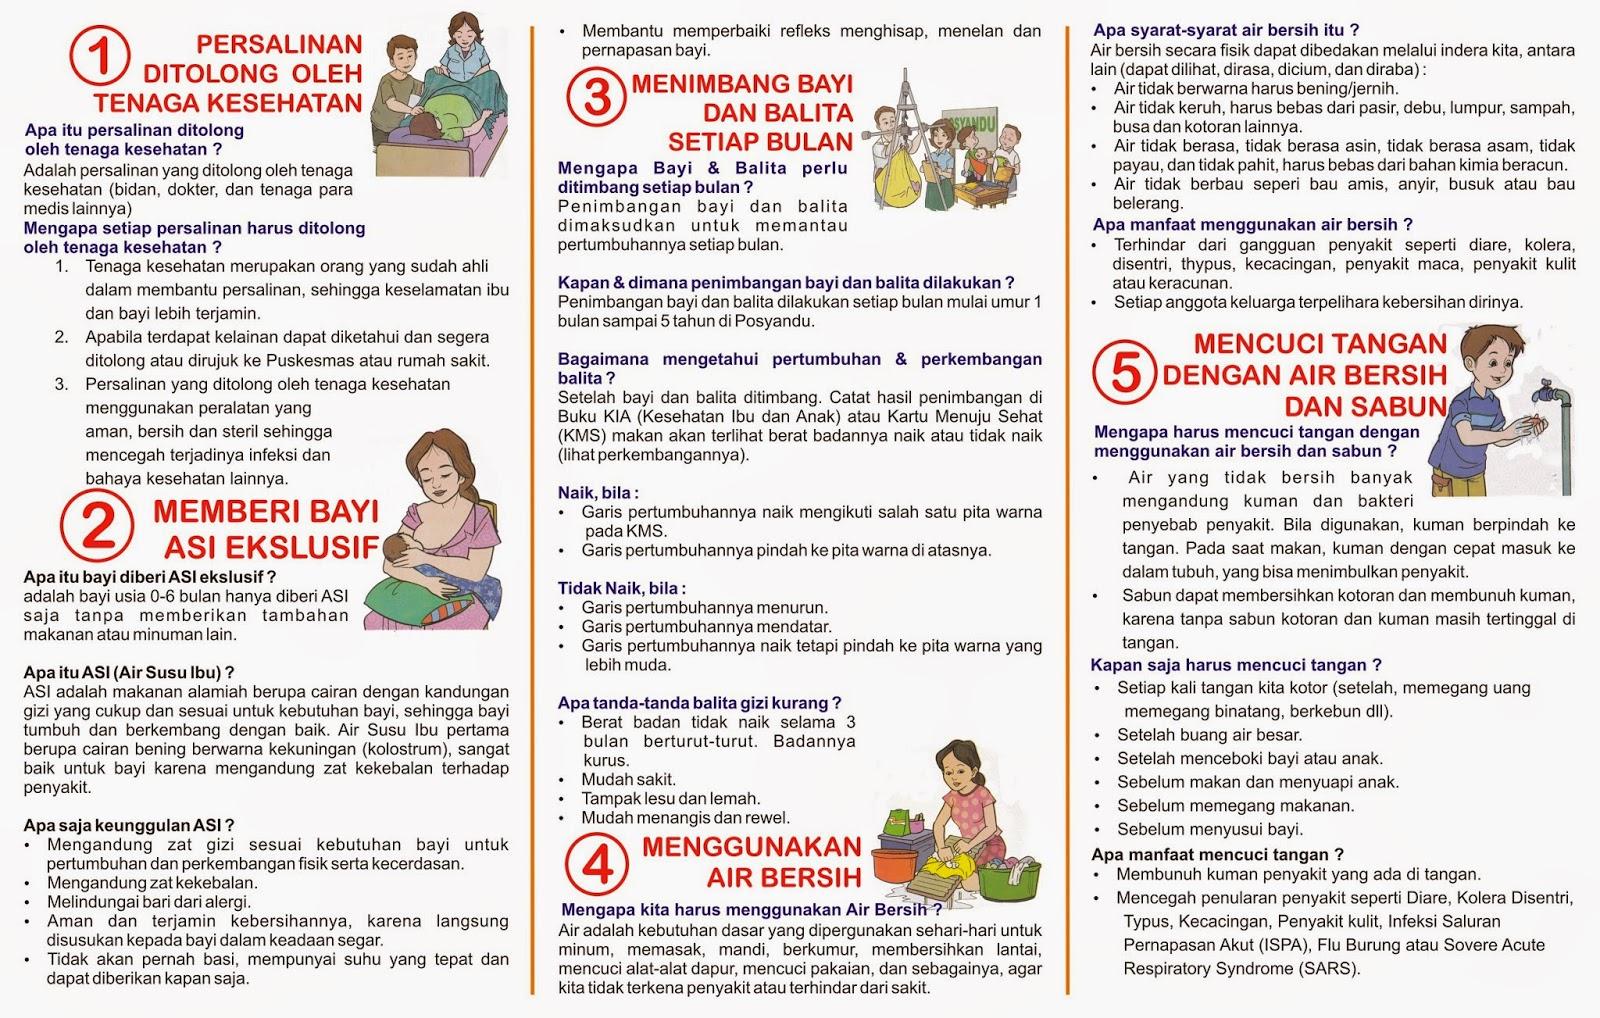 Liflet Phbs Pnpm Gsc Desa Tanjungjaya